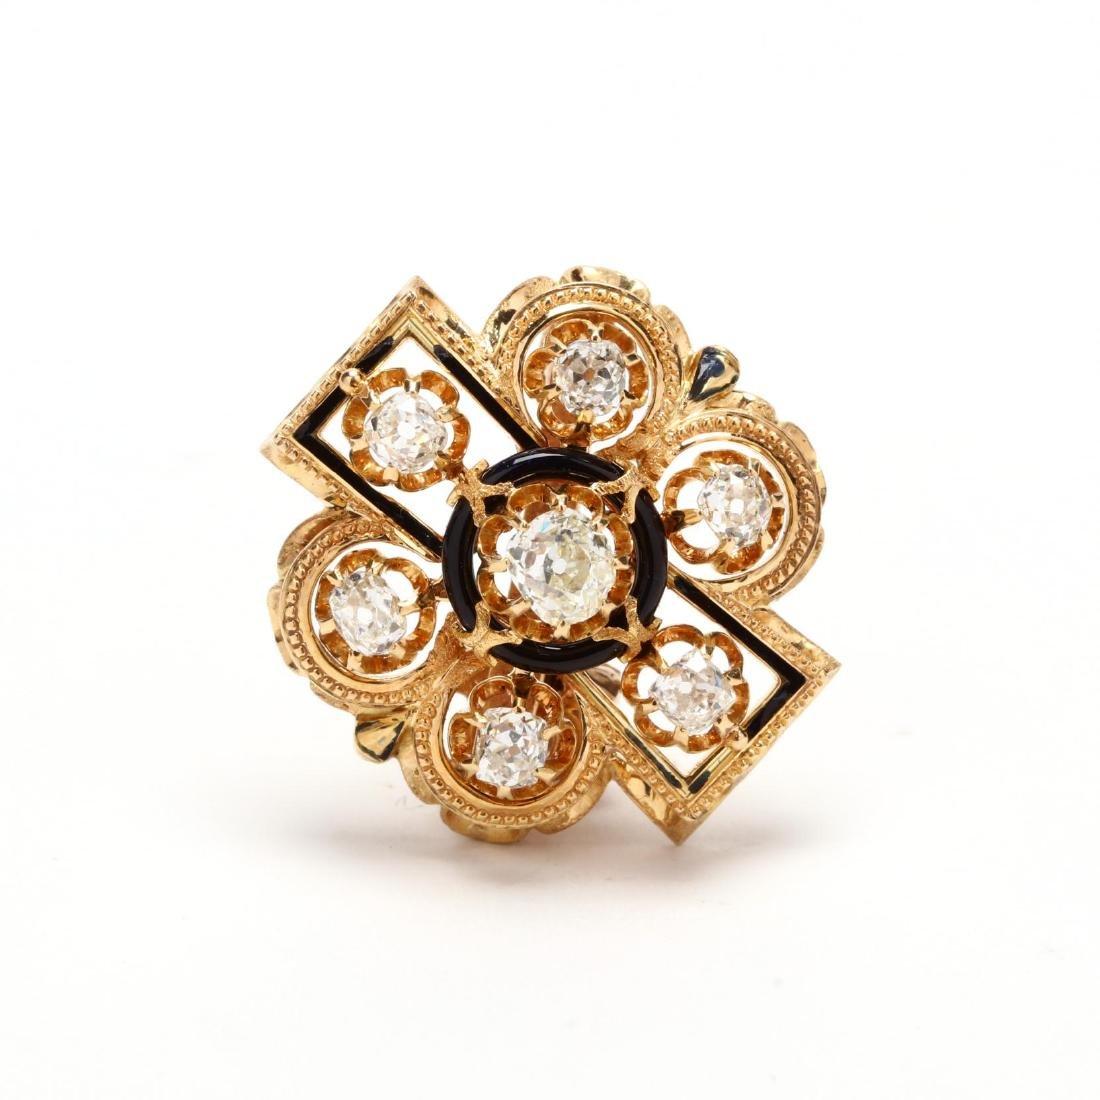 Victorian Gold, Diamond, and Enamel Pendant